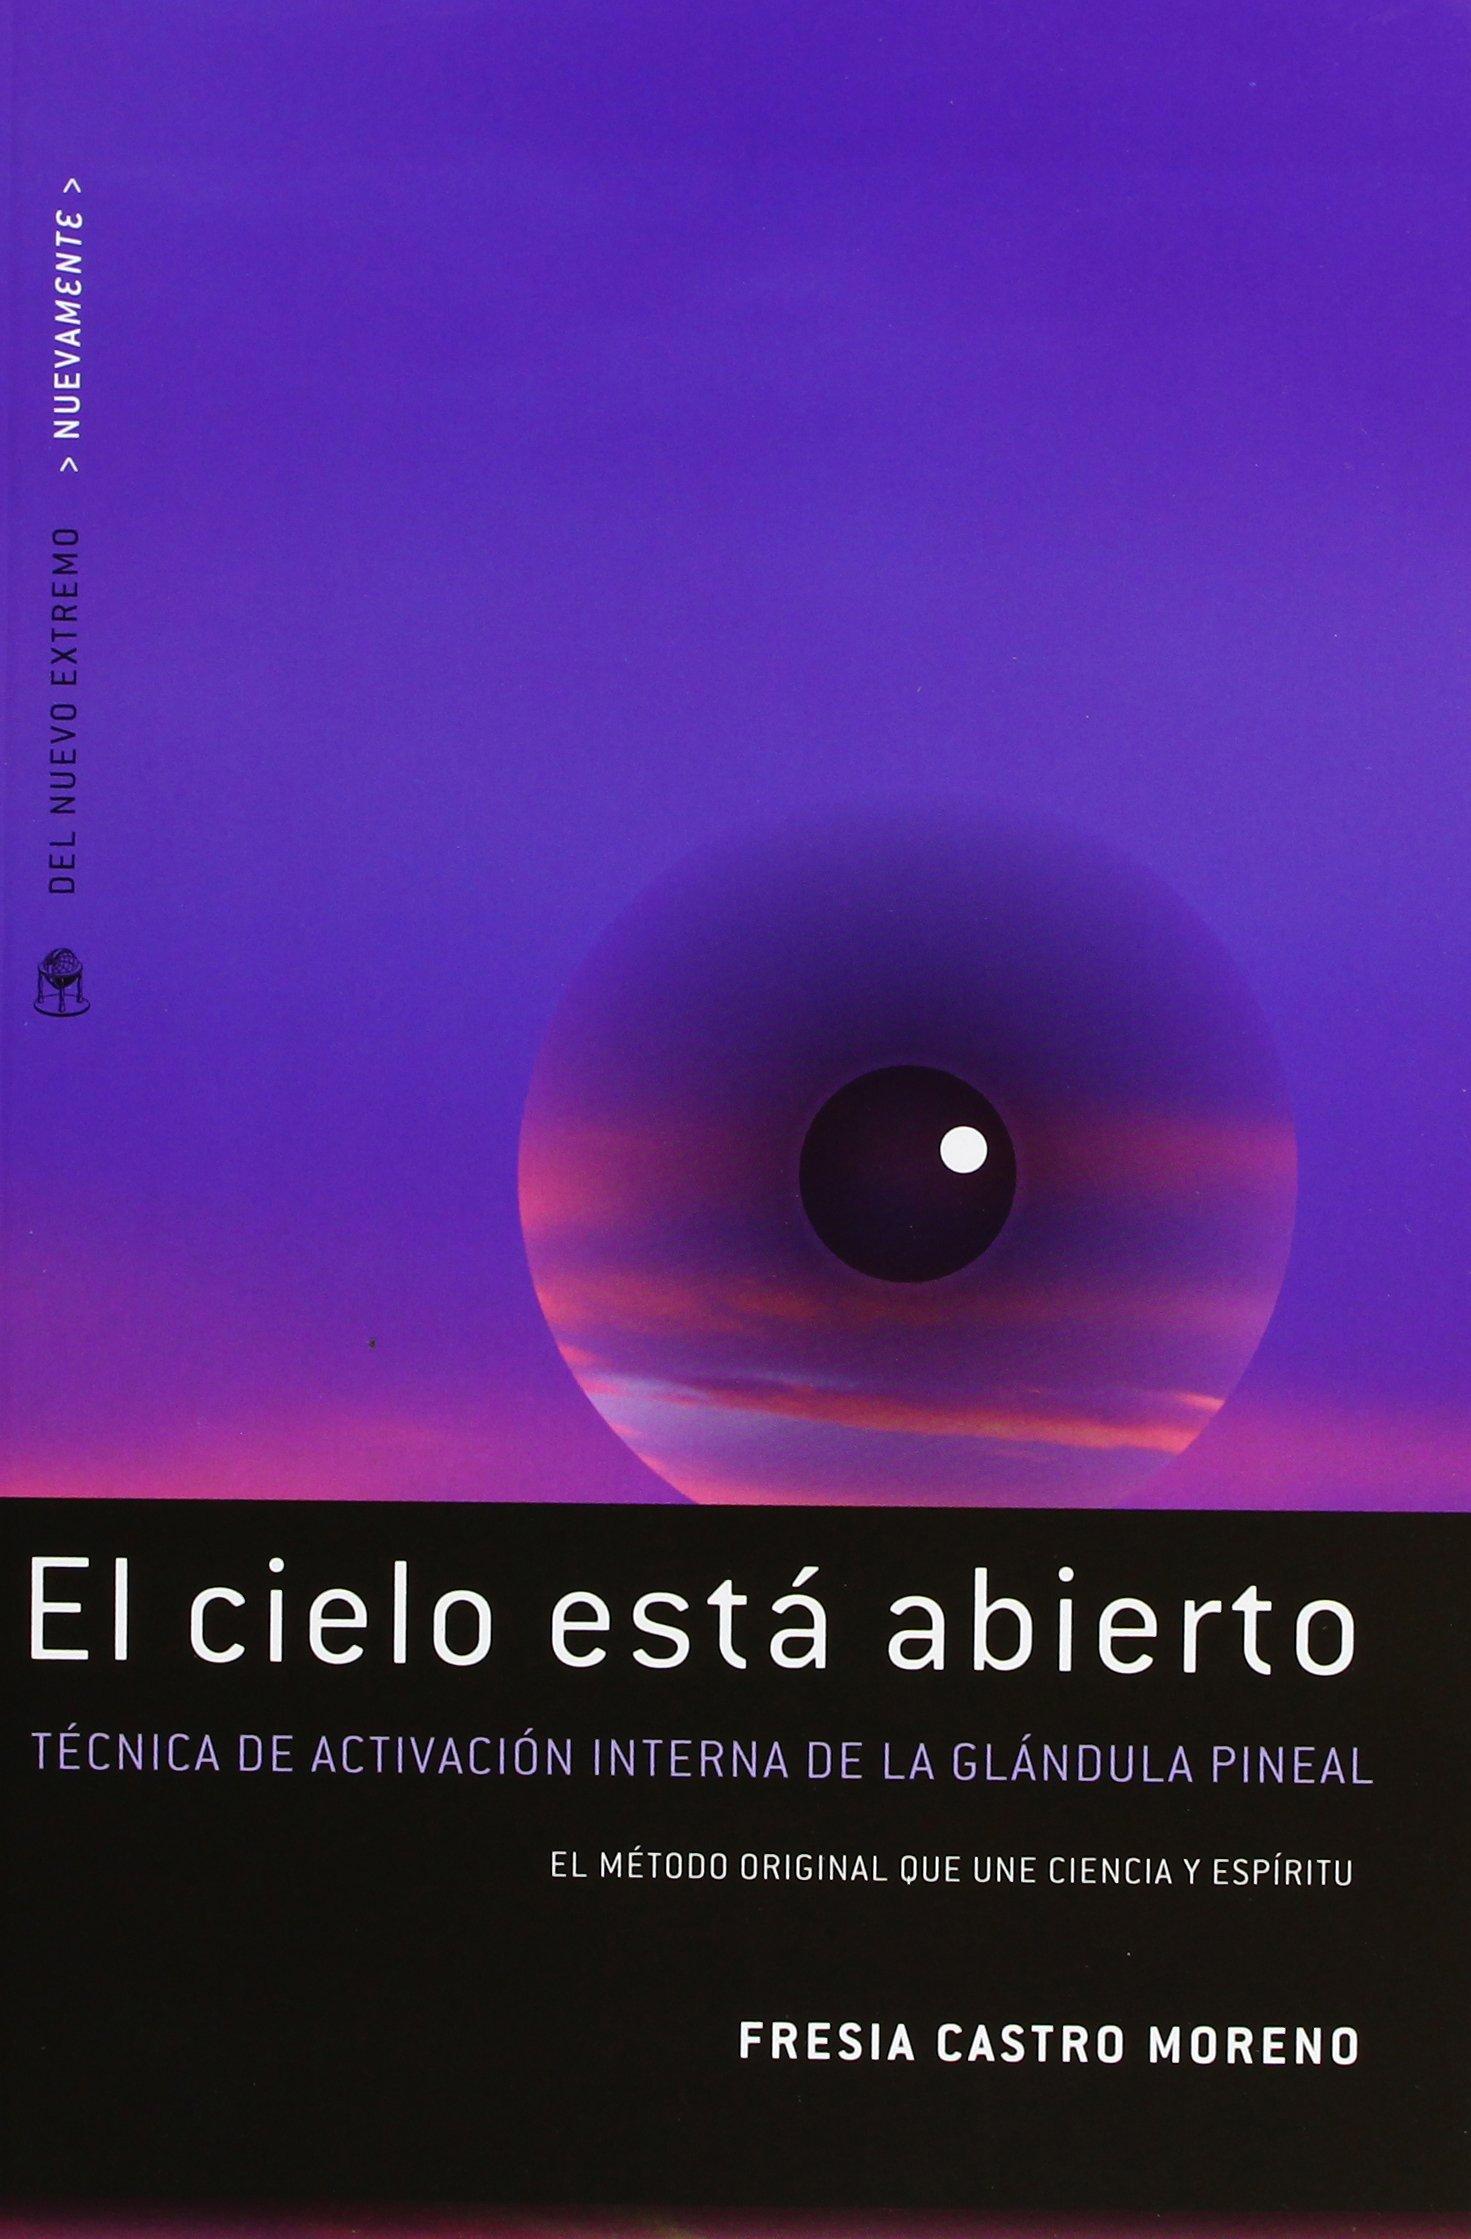 CIELO ESTA ABIERTO, EL (Spanish Edition): FRESIA CASTRO MORENO: 9789876093088: Amazon.com: Books